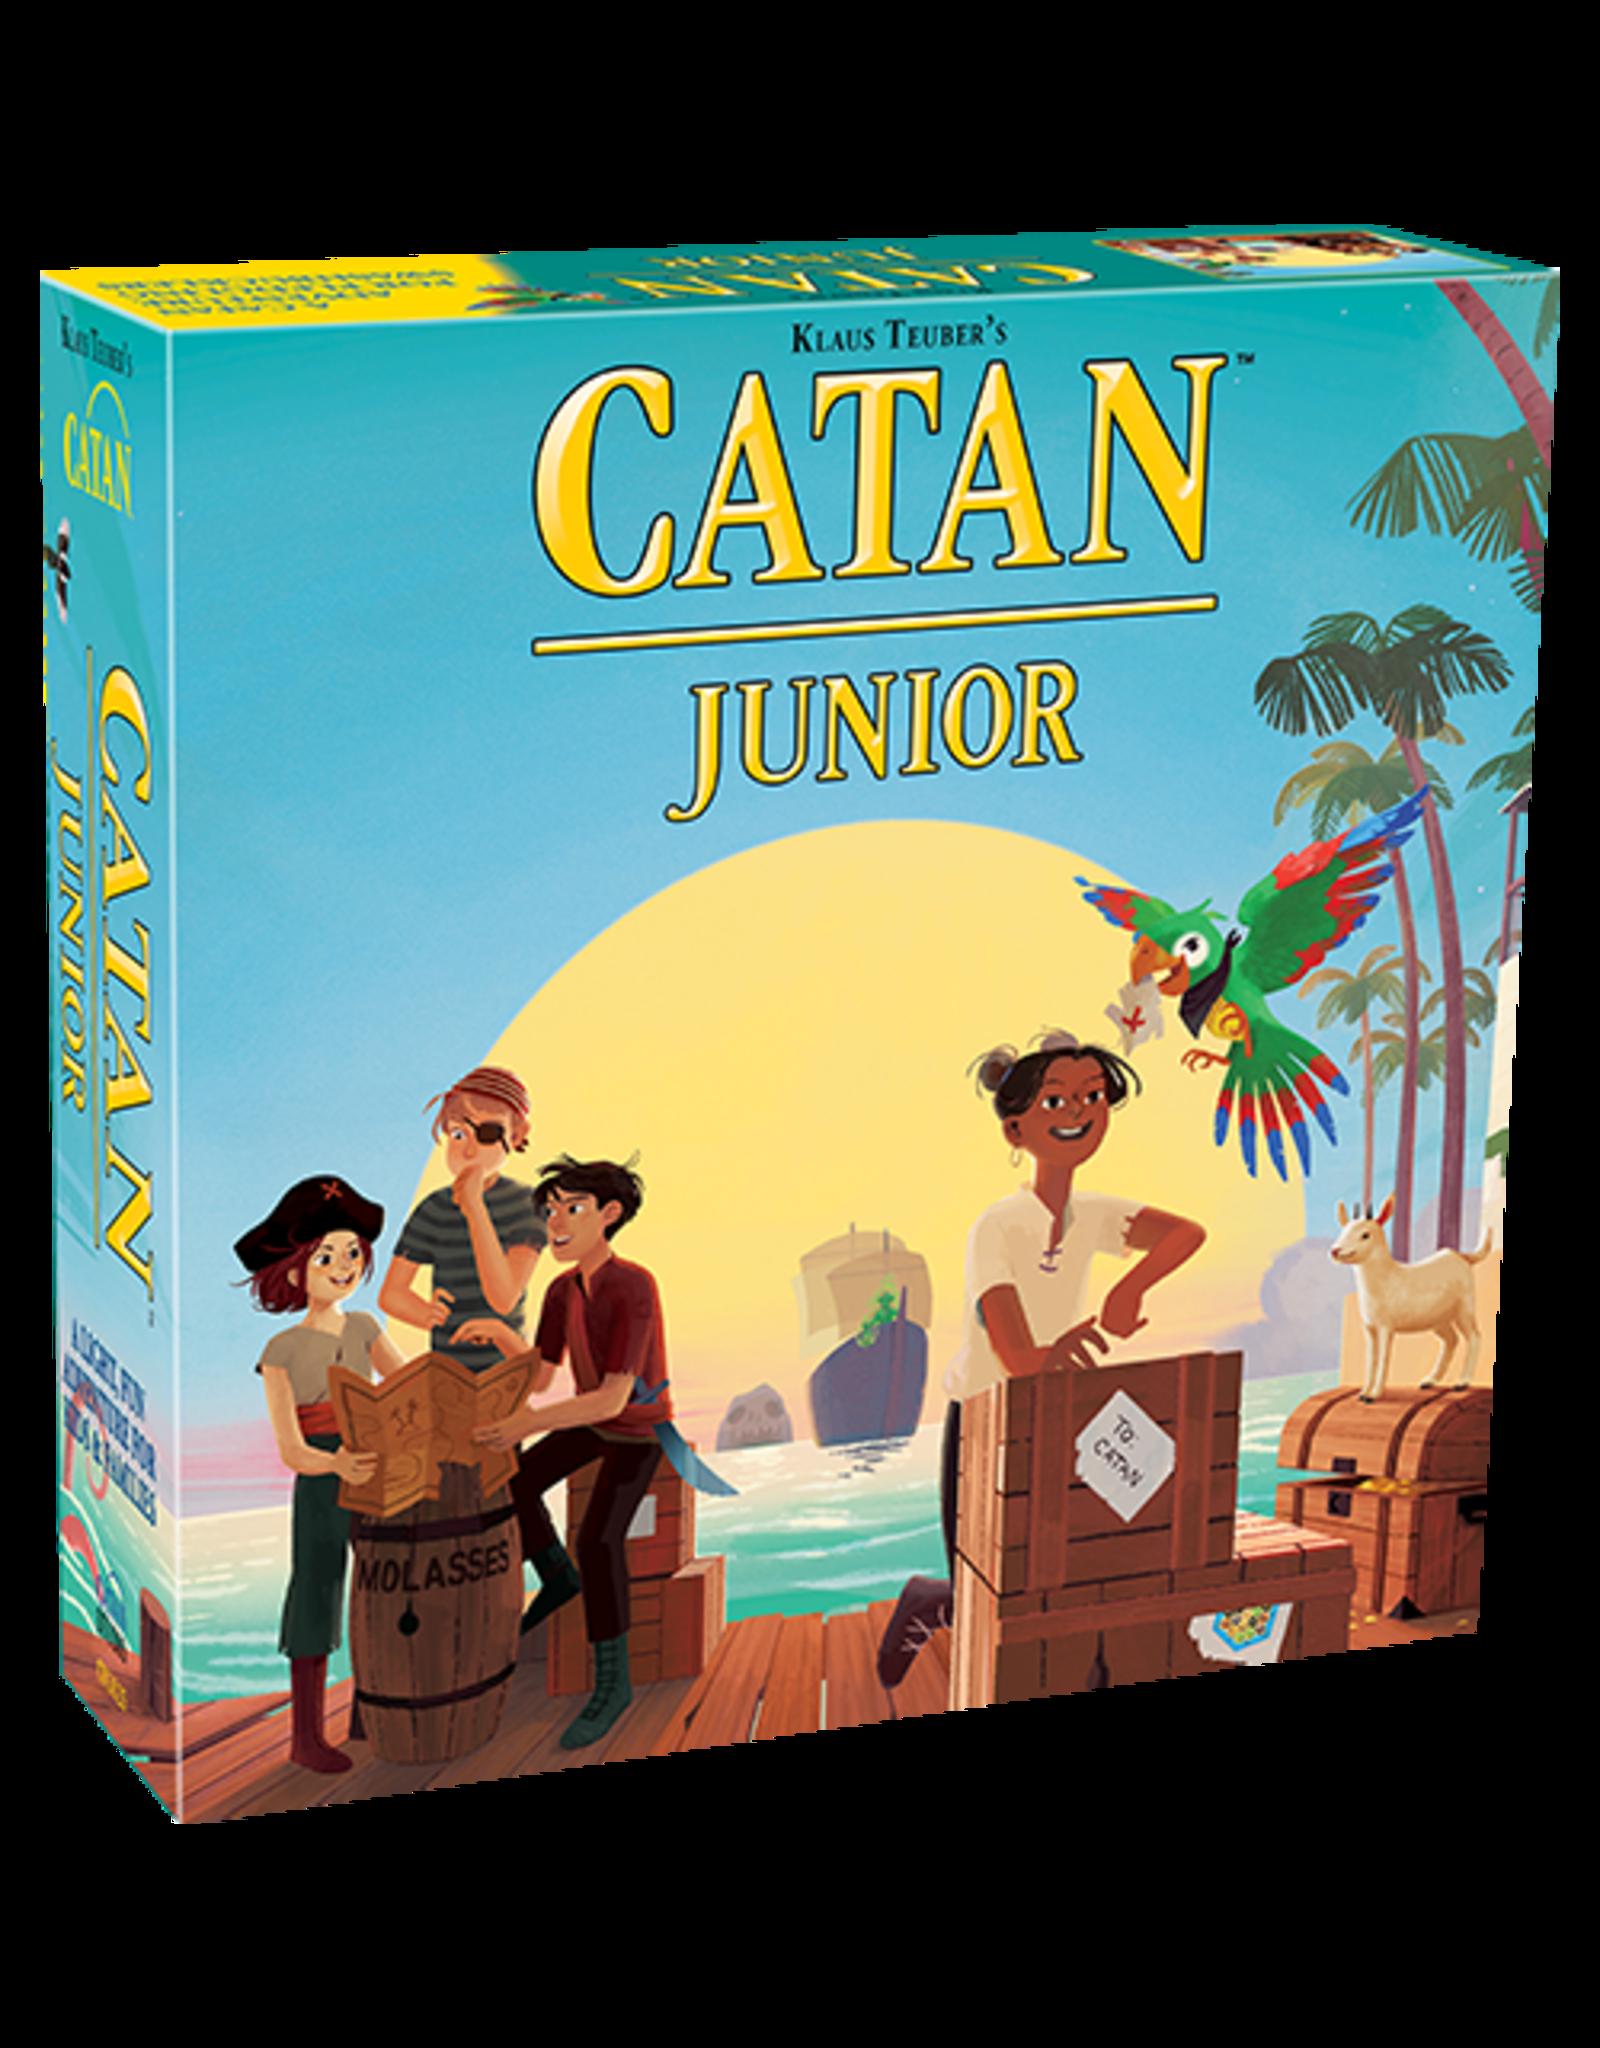 Catan Studio Settlers of Catan: Catan Junior